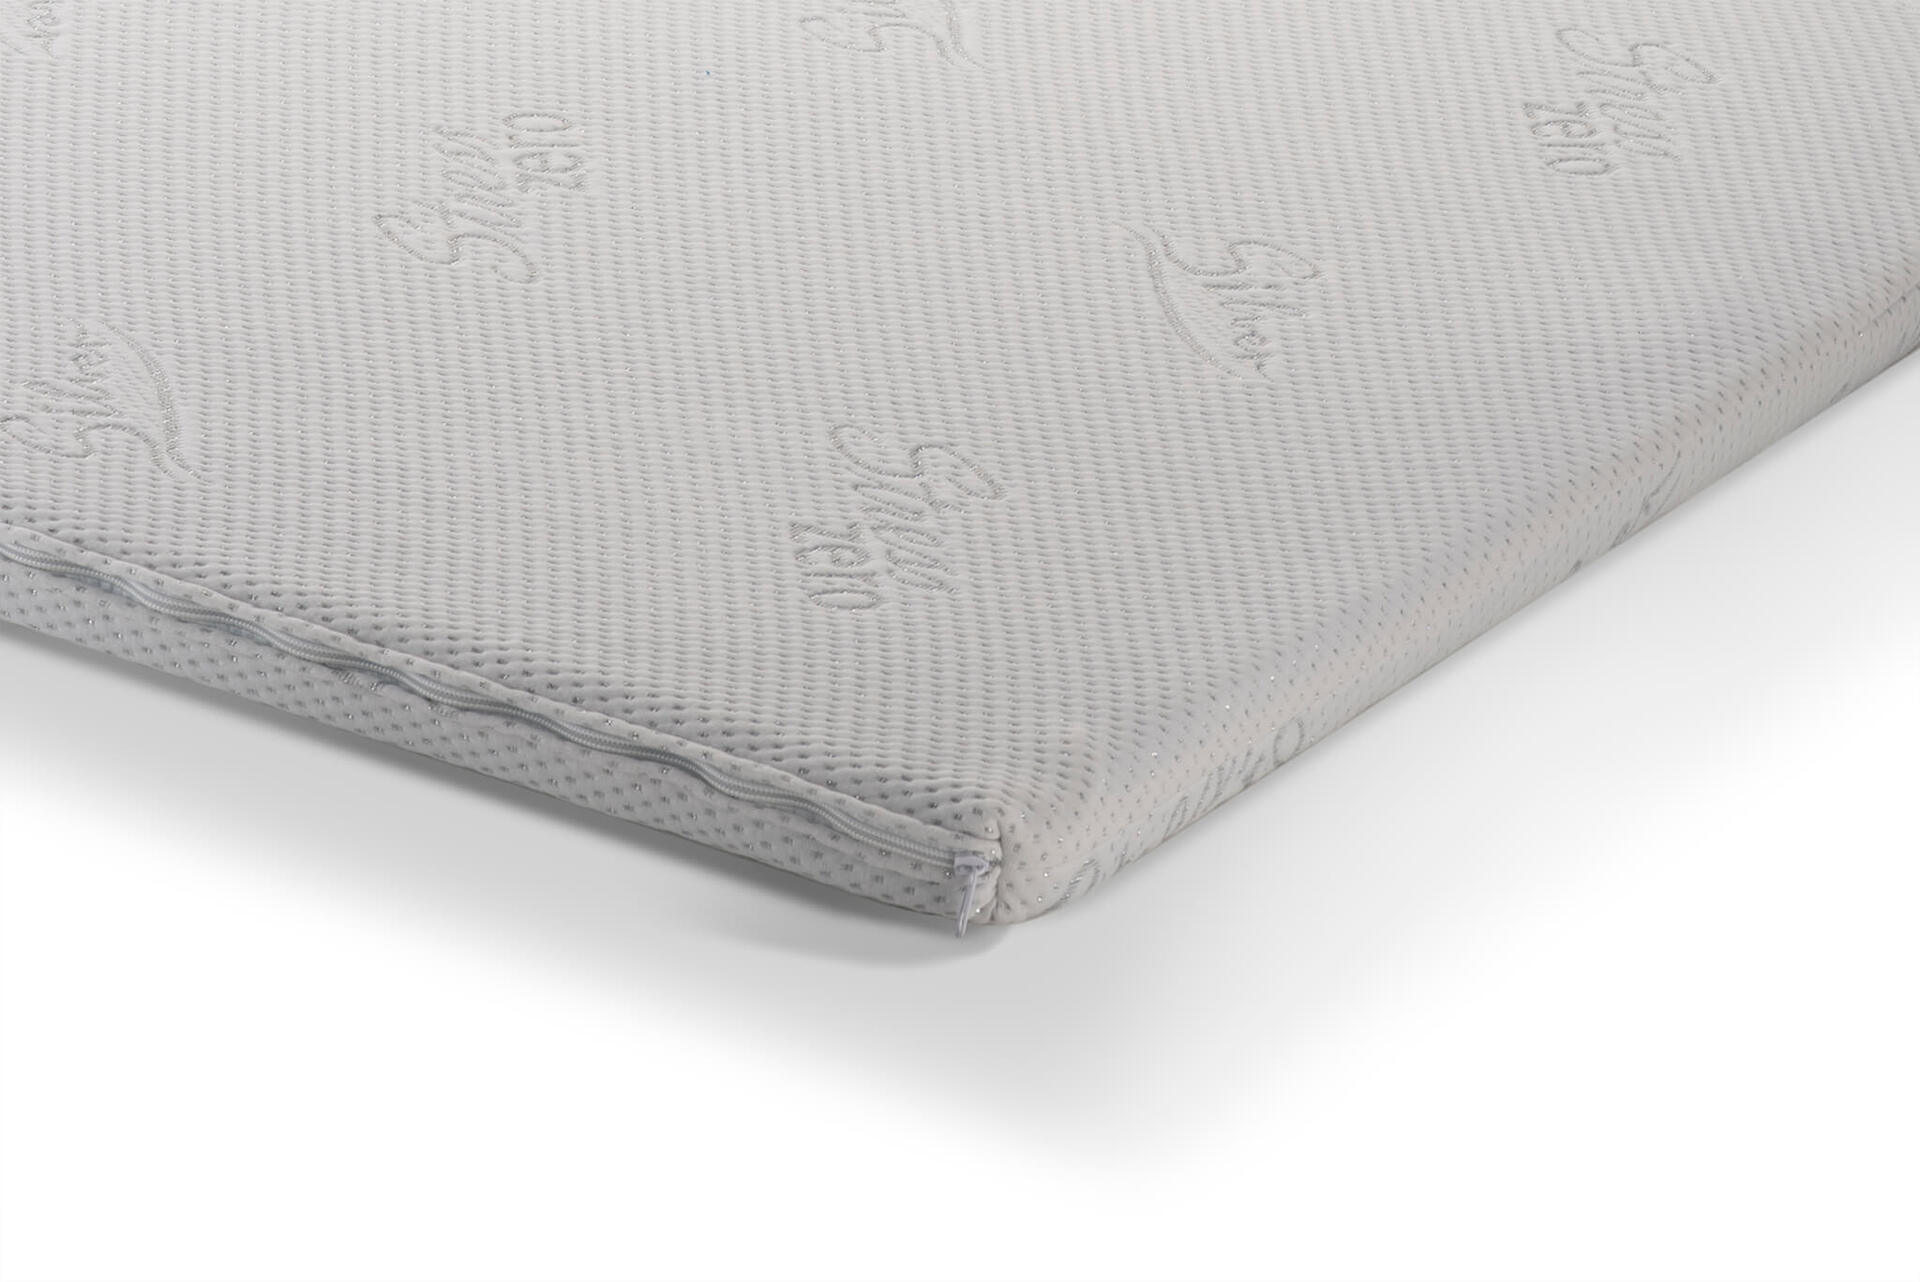 Топ матрак Cool Silver, 82/190/5 см. - Sleepy